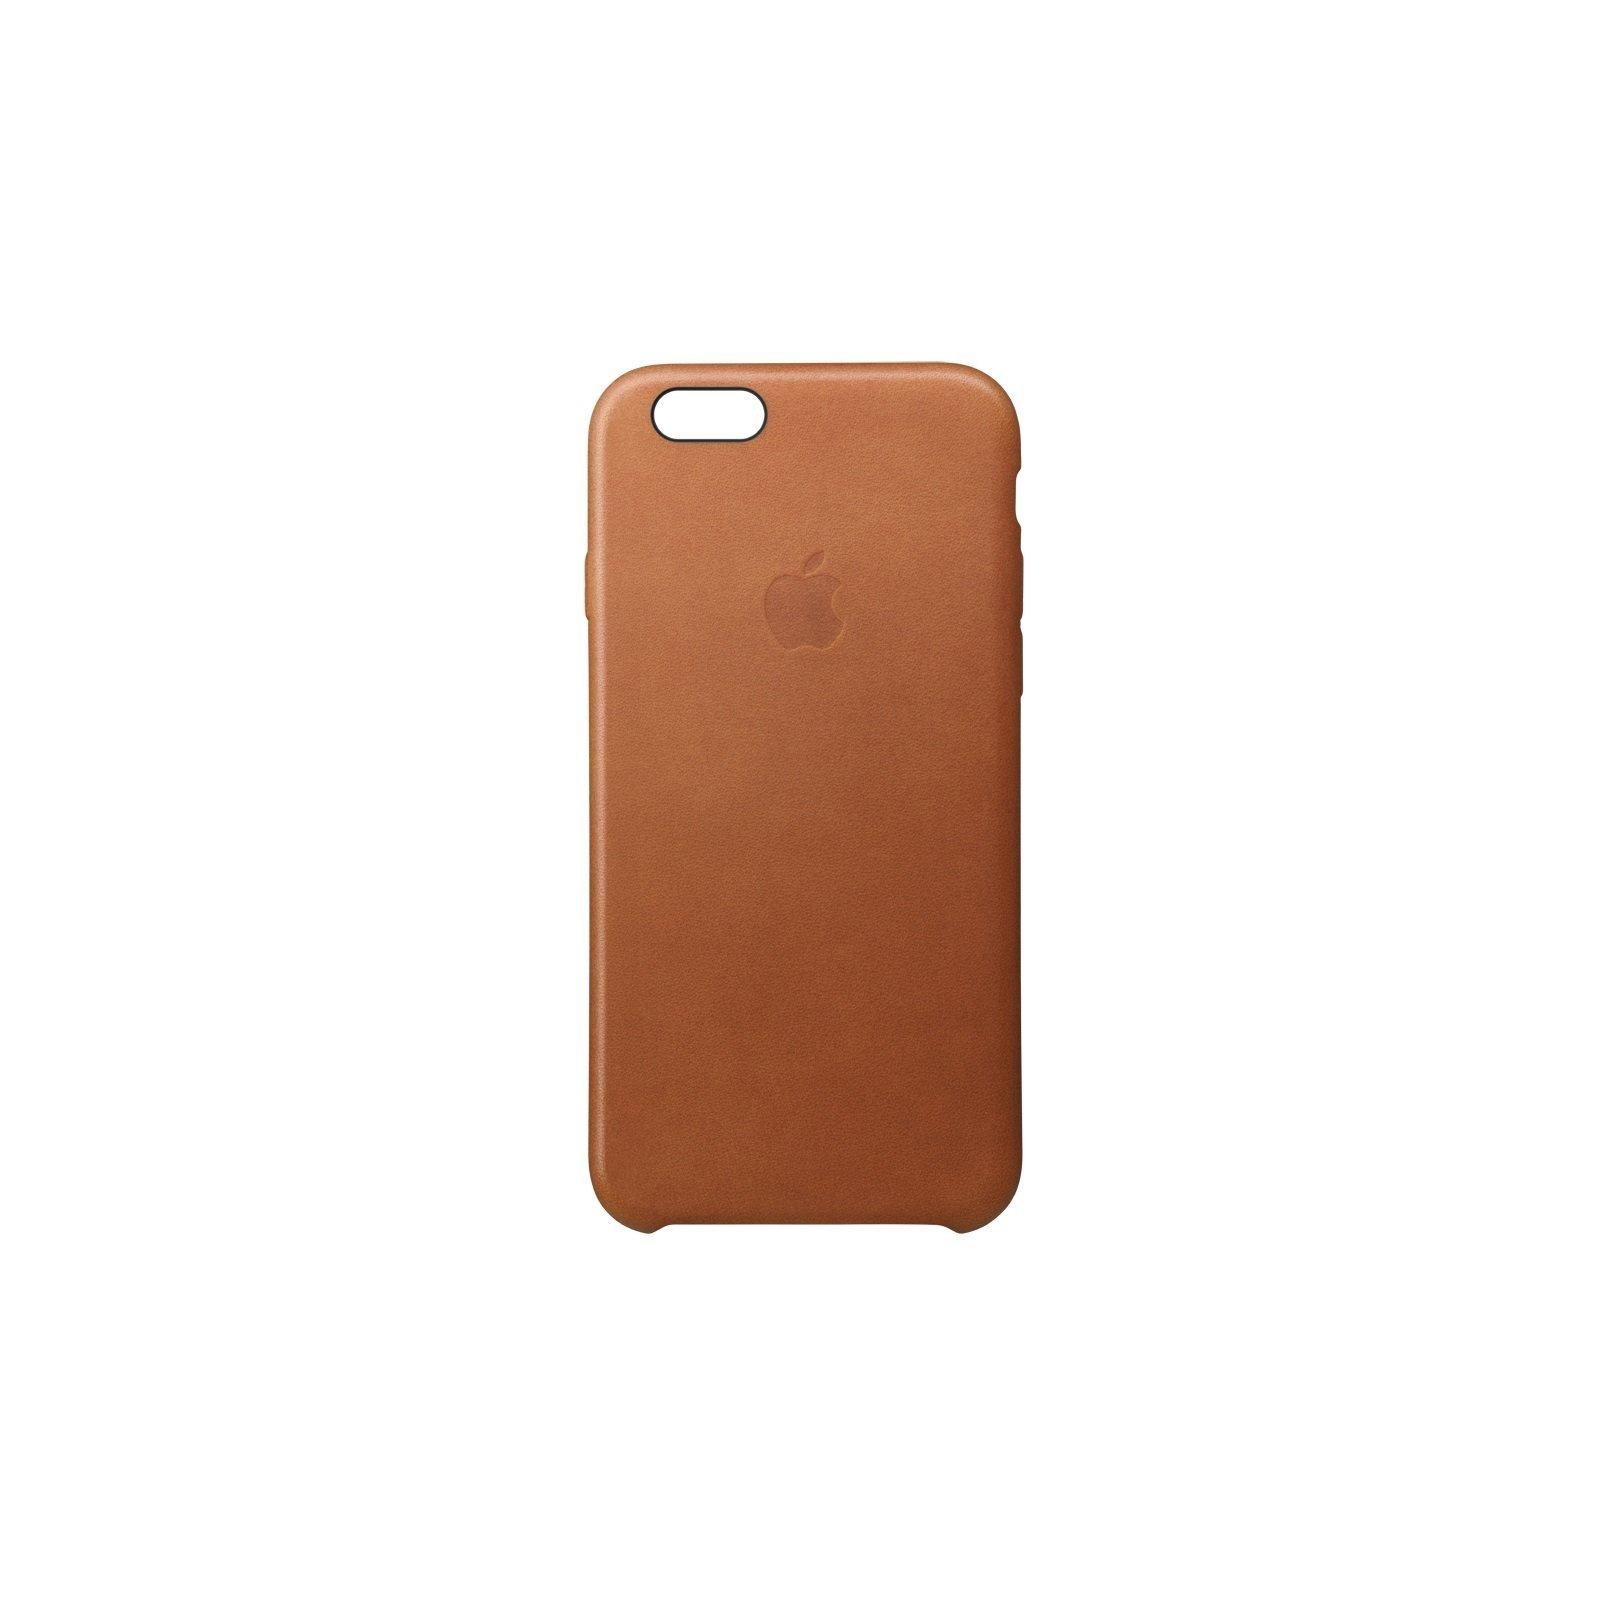 Чехол для моб. телефона Apple для iPhone 6 Plus/6s Plus Saddle Brown (MKXC2ZM/A)